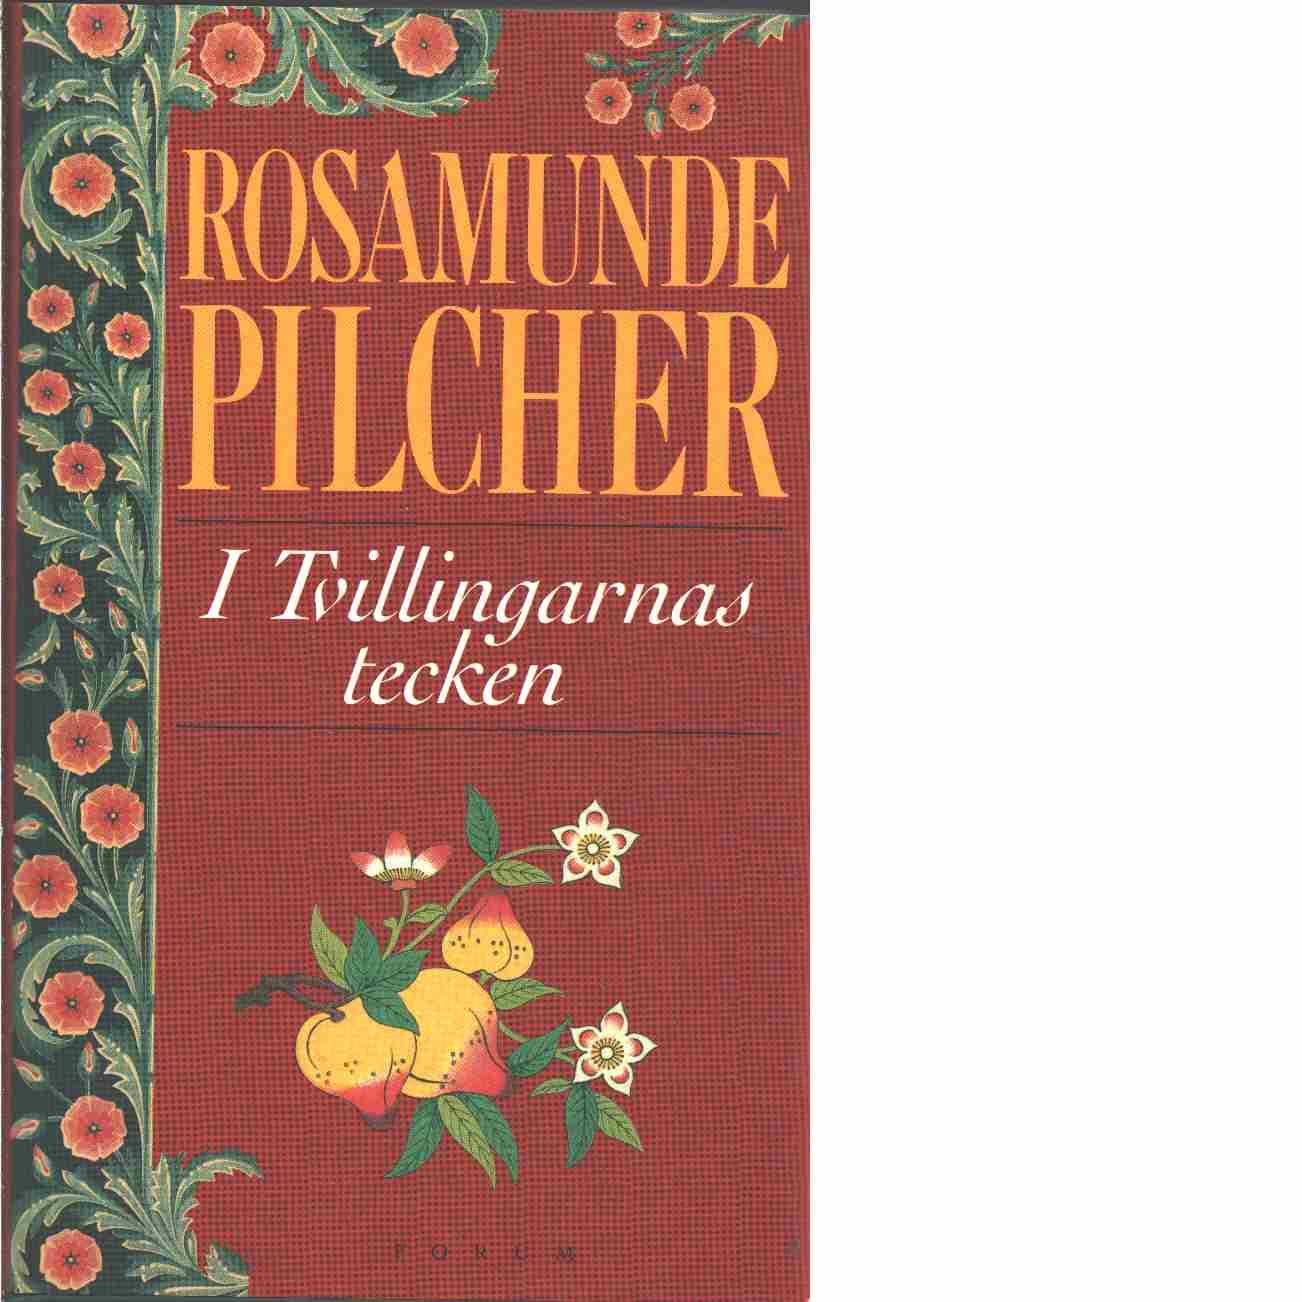 I Tvillingarnas tecken - Pilcher, Rosamunde